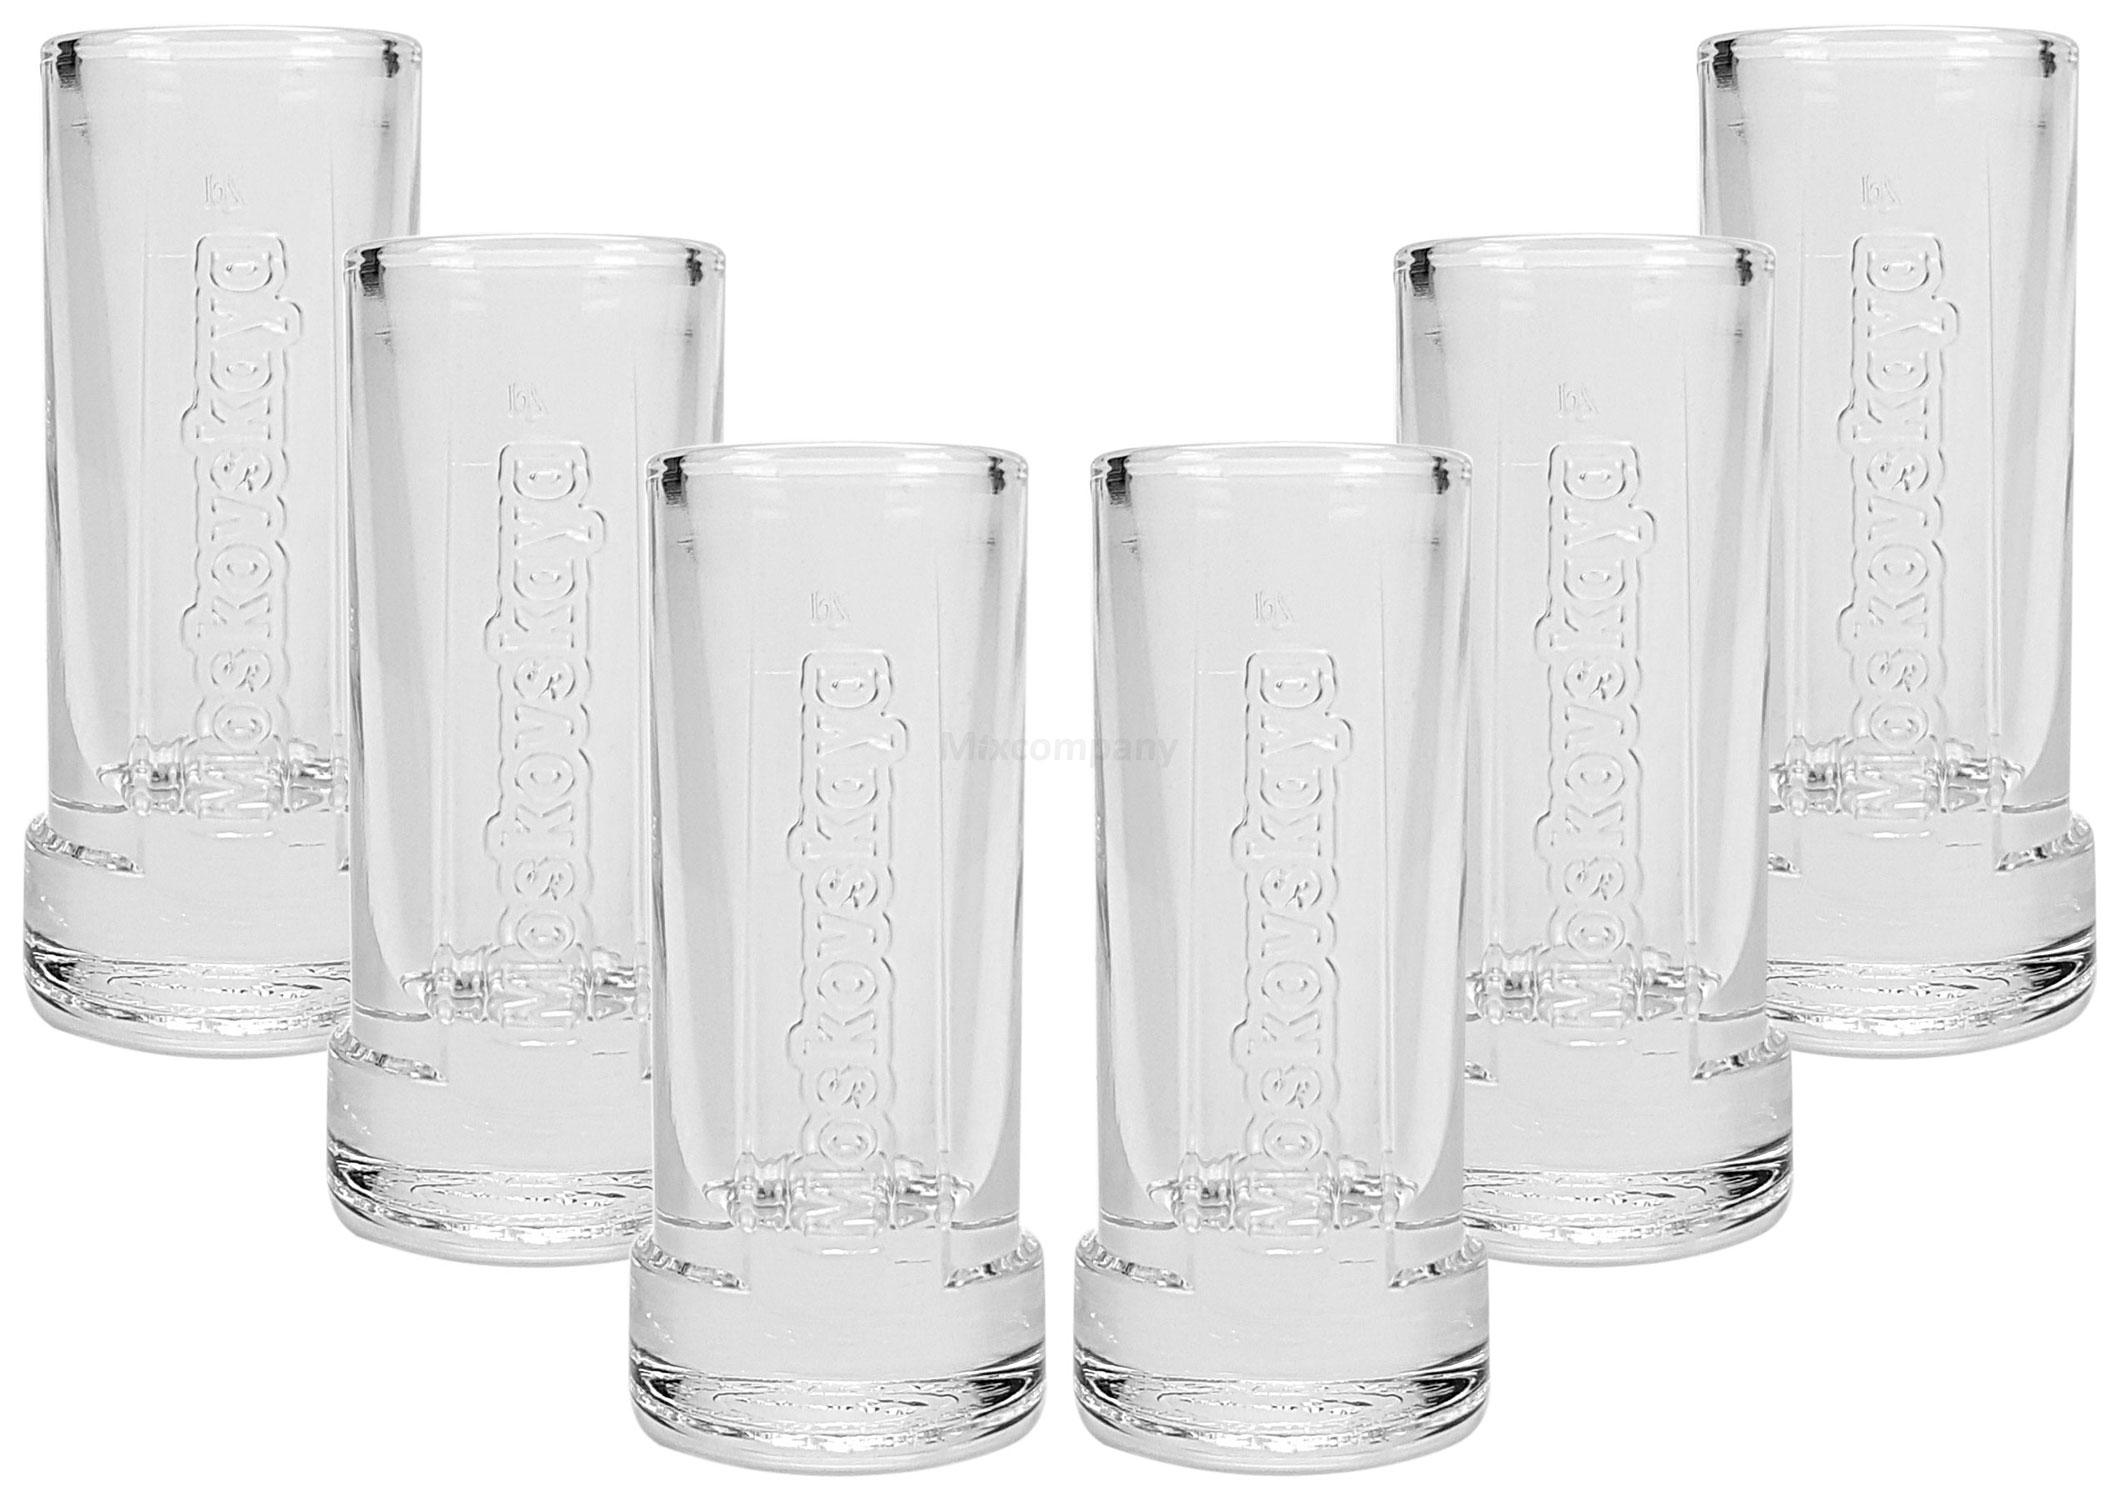 Moskovskaya Shotglas Glas Gläser Set - 6x Shotgläser 2cl geeicht